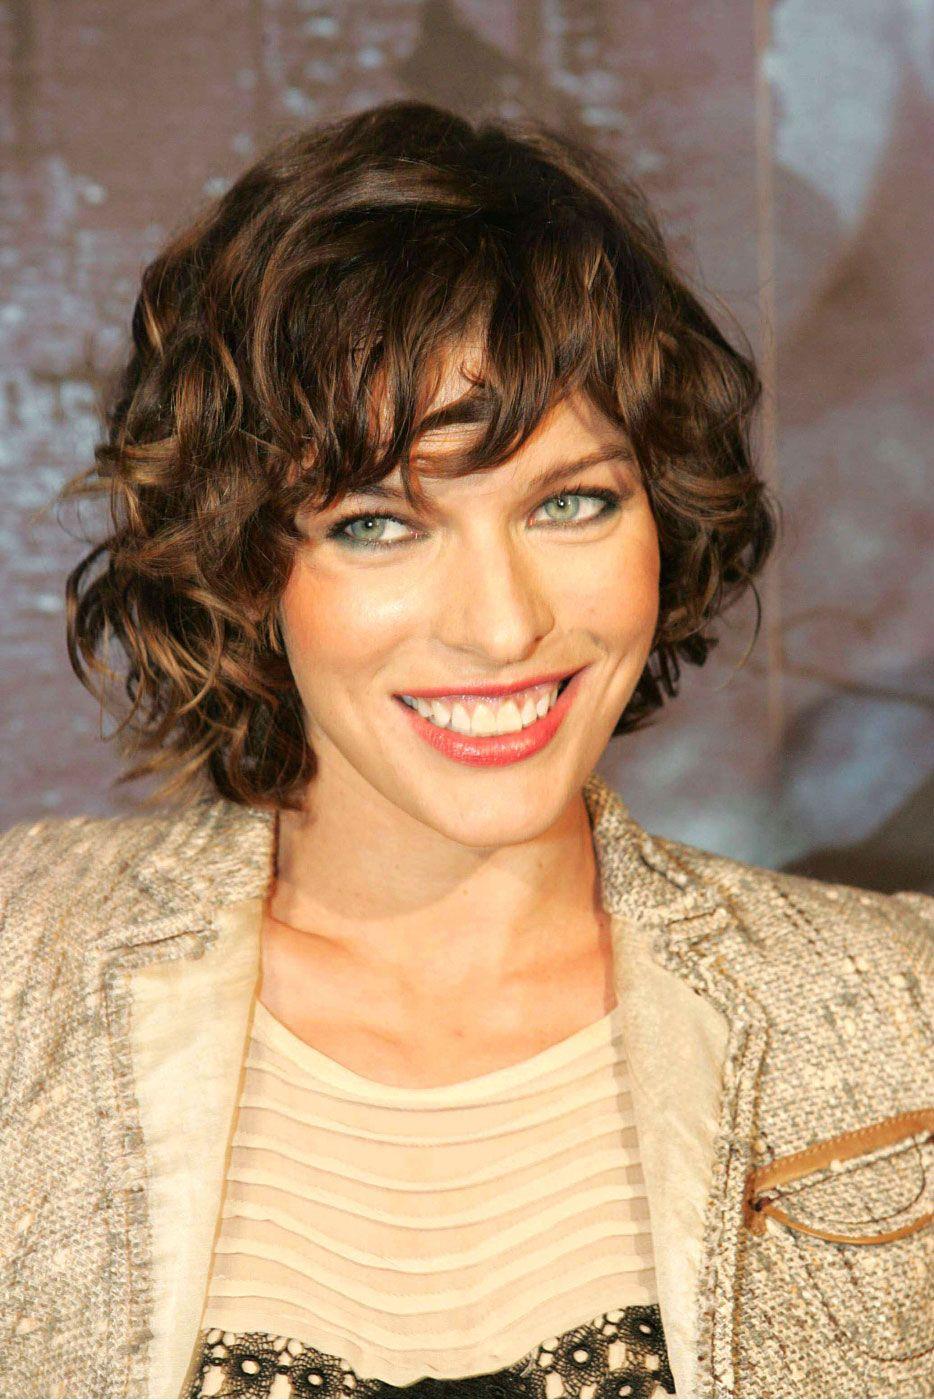 Milla Jovovich Curly Hair Styles Short Curly Hair Short Hair Updo